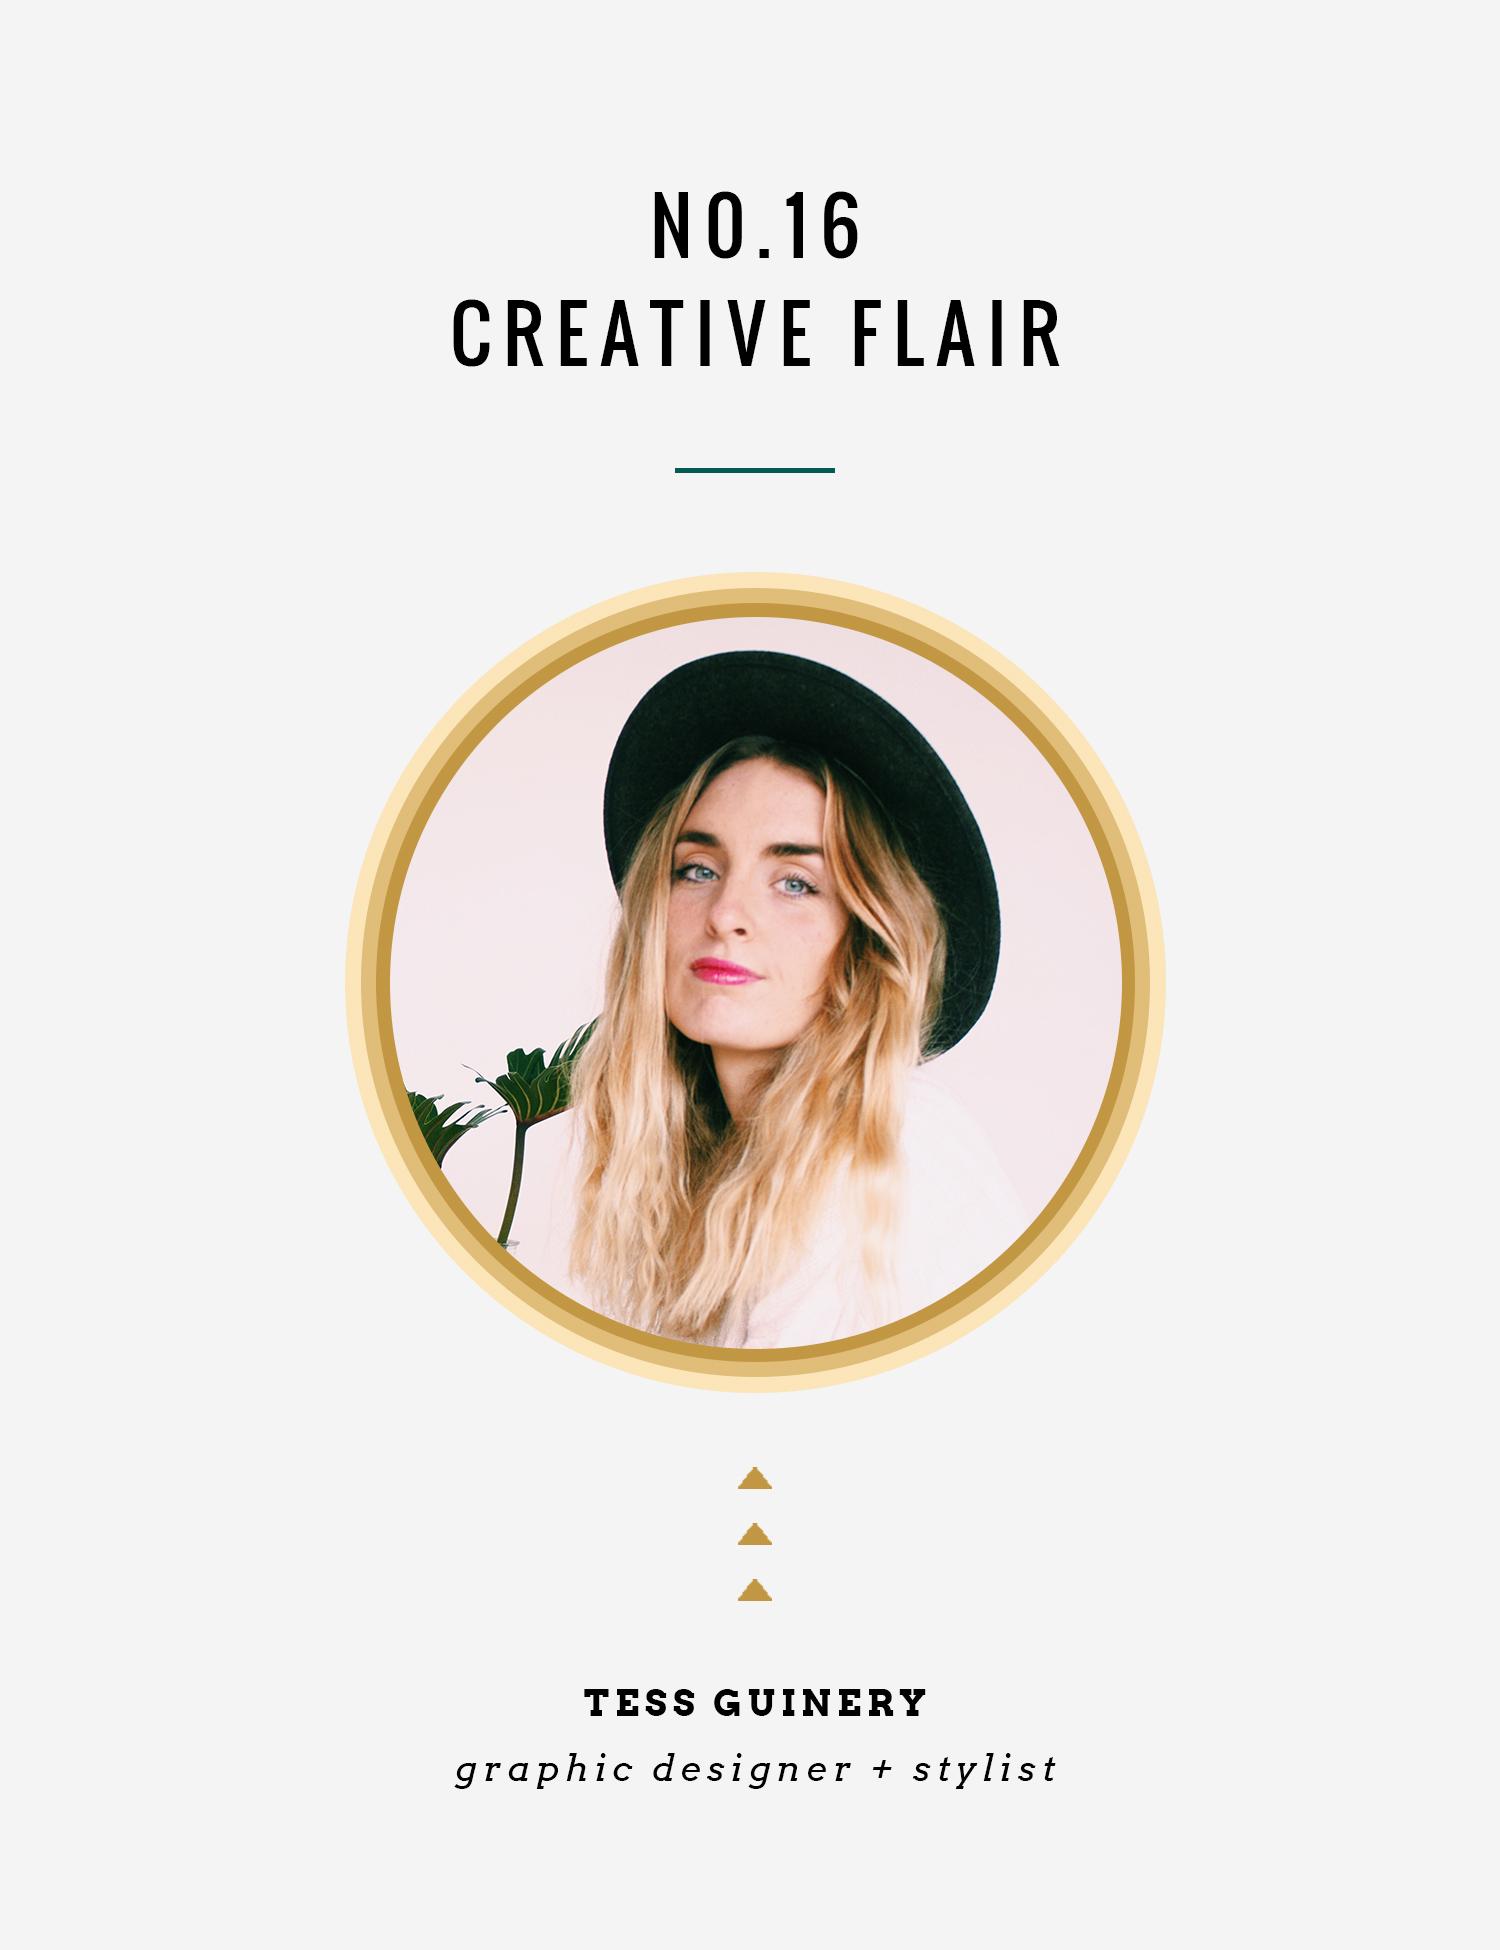 creativeflair_tessguinery_inbetween